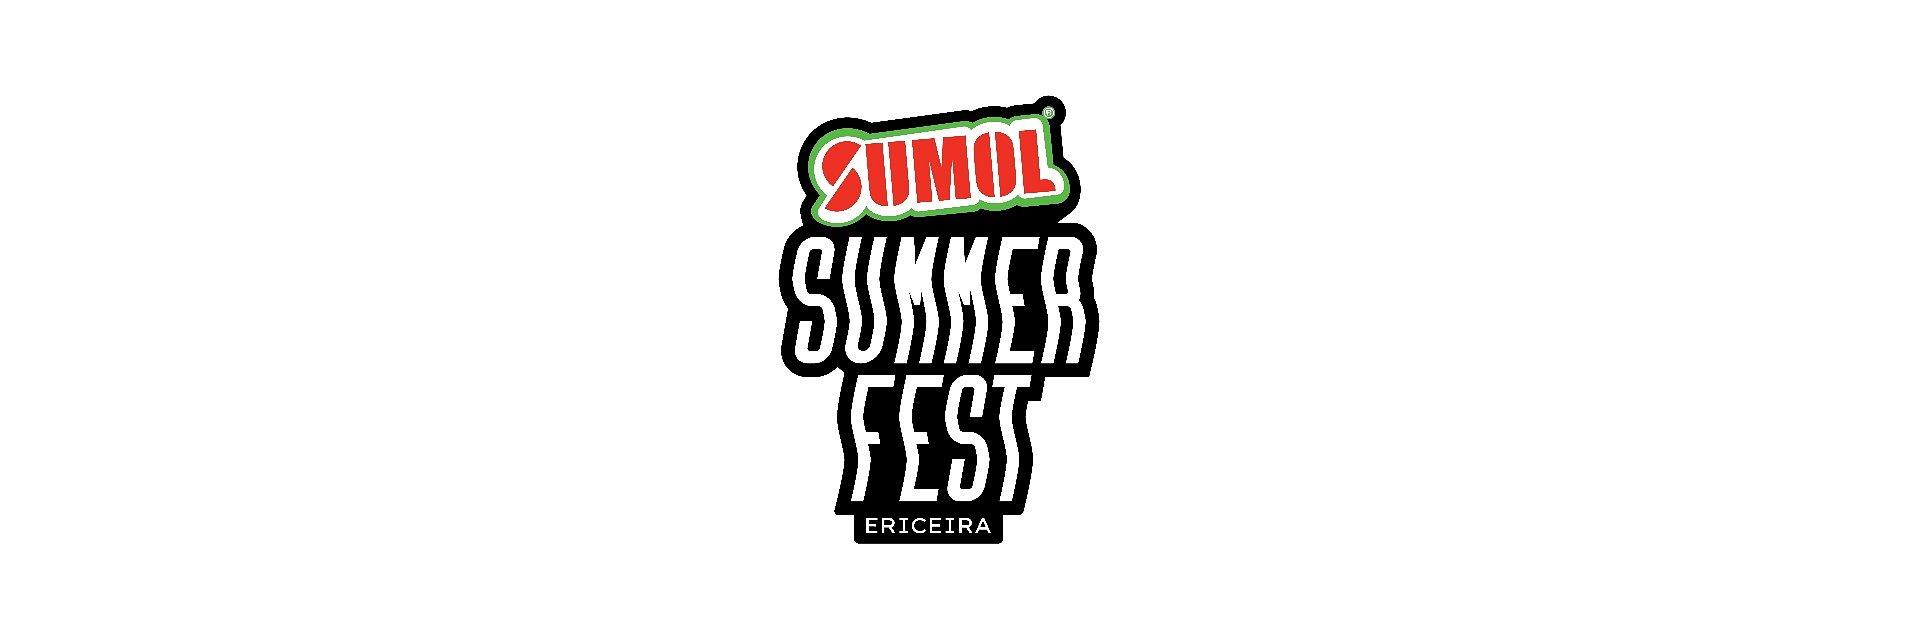 Nova confirmação Sumol Summer Fest :JULINHO KSD